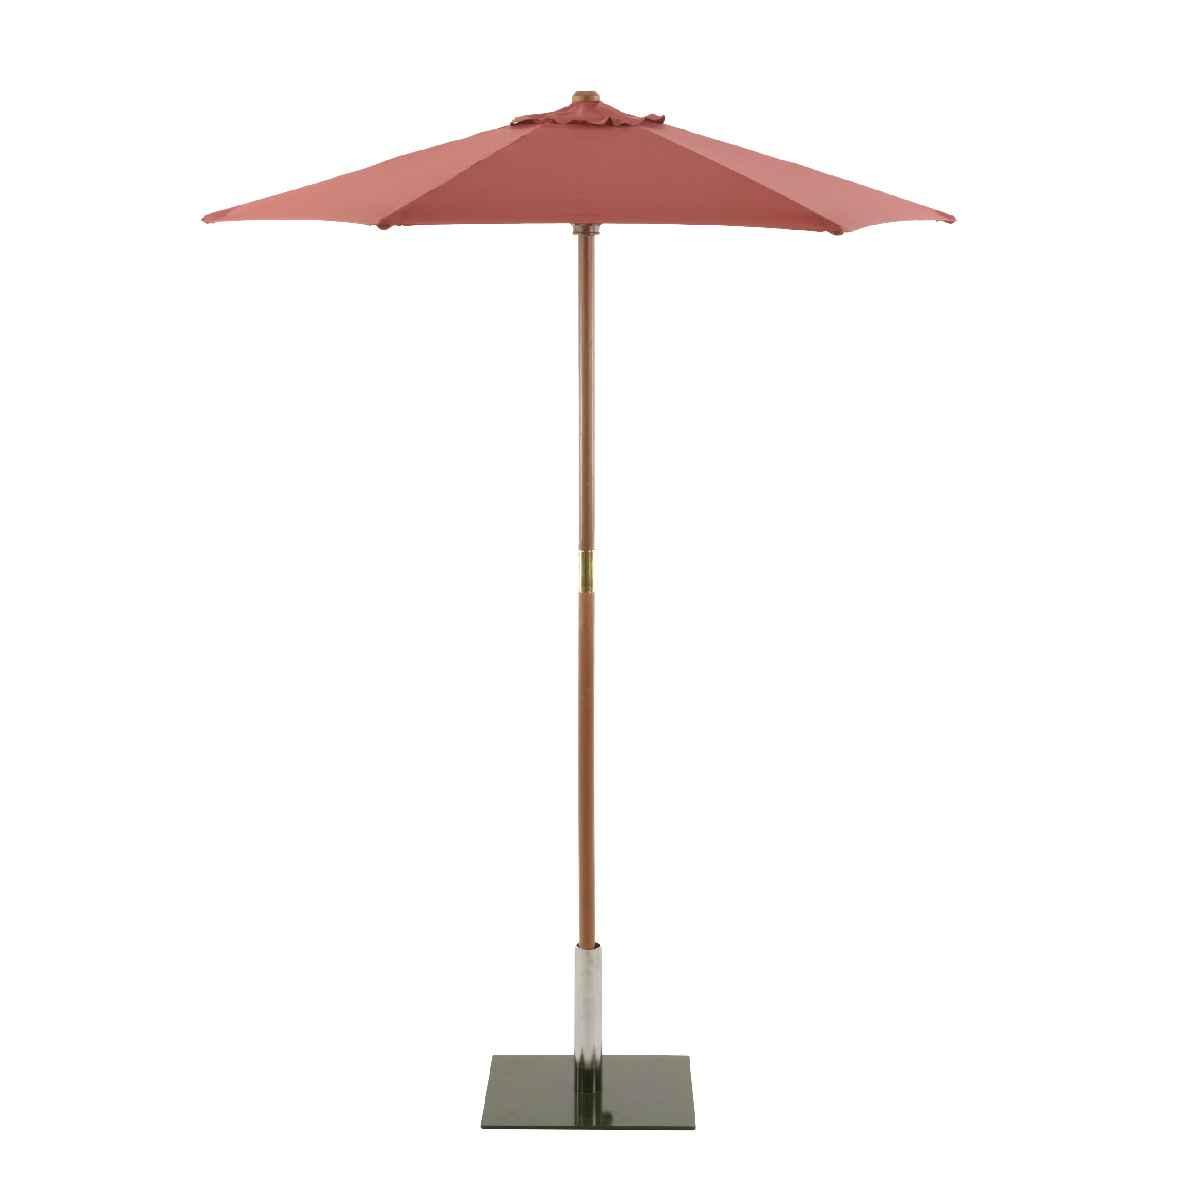 Sturdi Round 2m Wood Parasol (base not included) - Terracotta